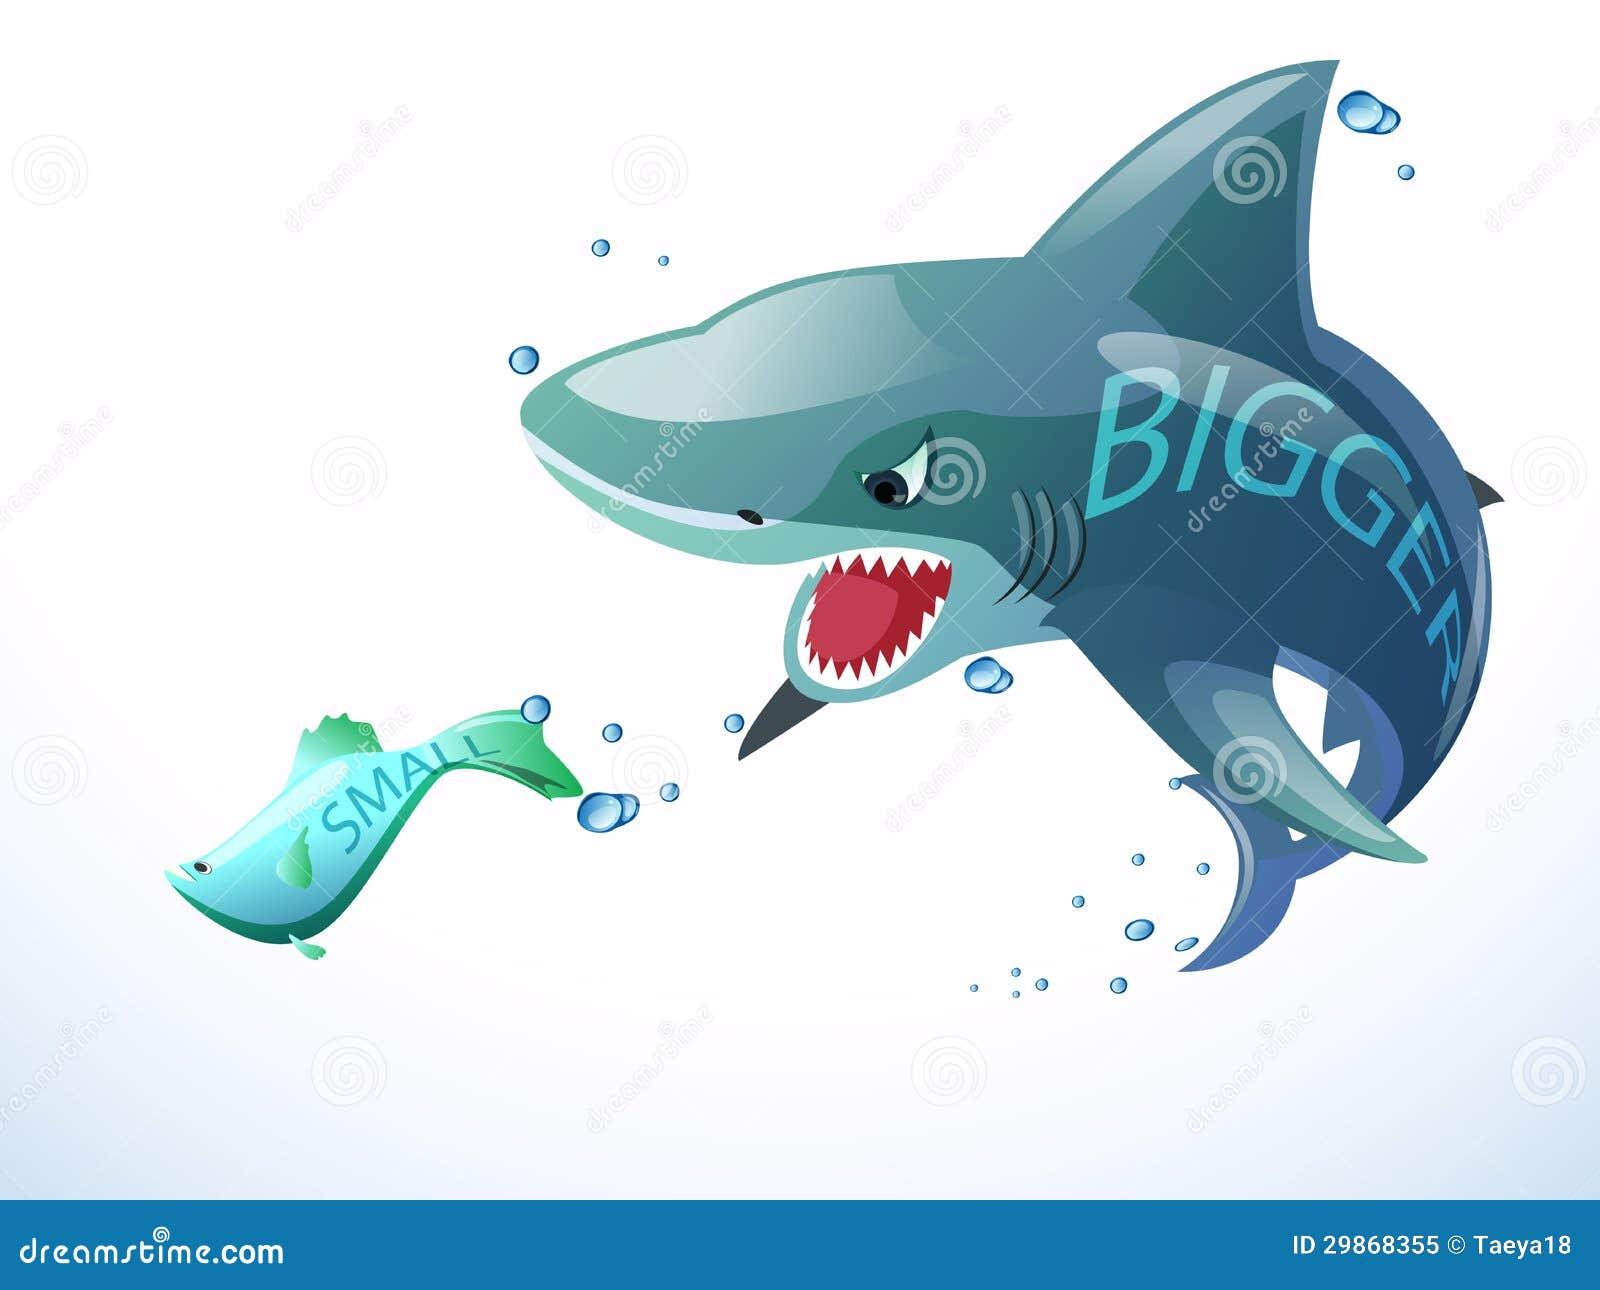 Shark eat small fish royalty free stock photo image for Dreaming of eating fish